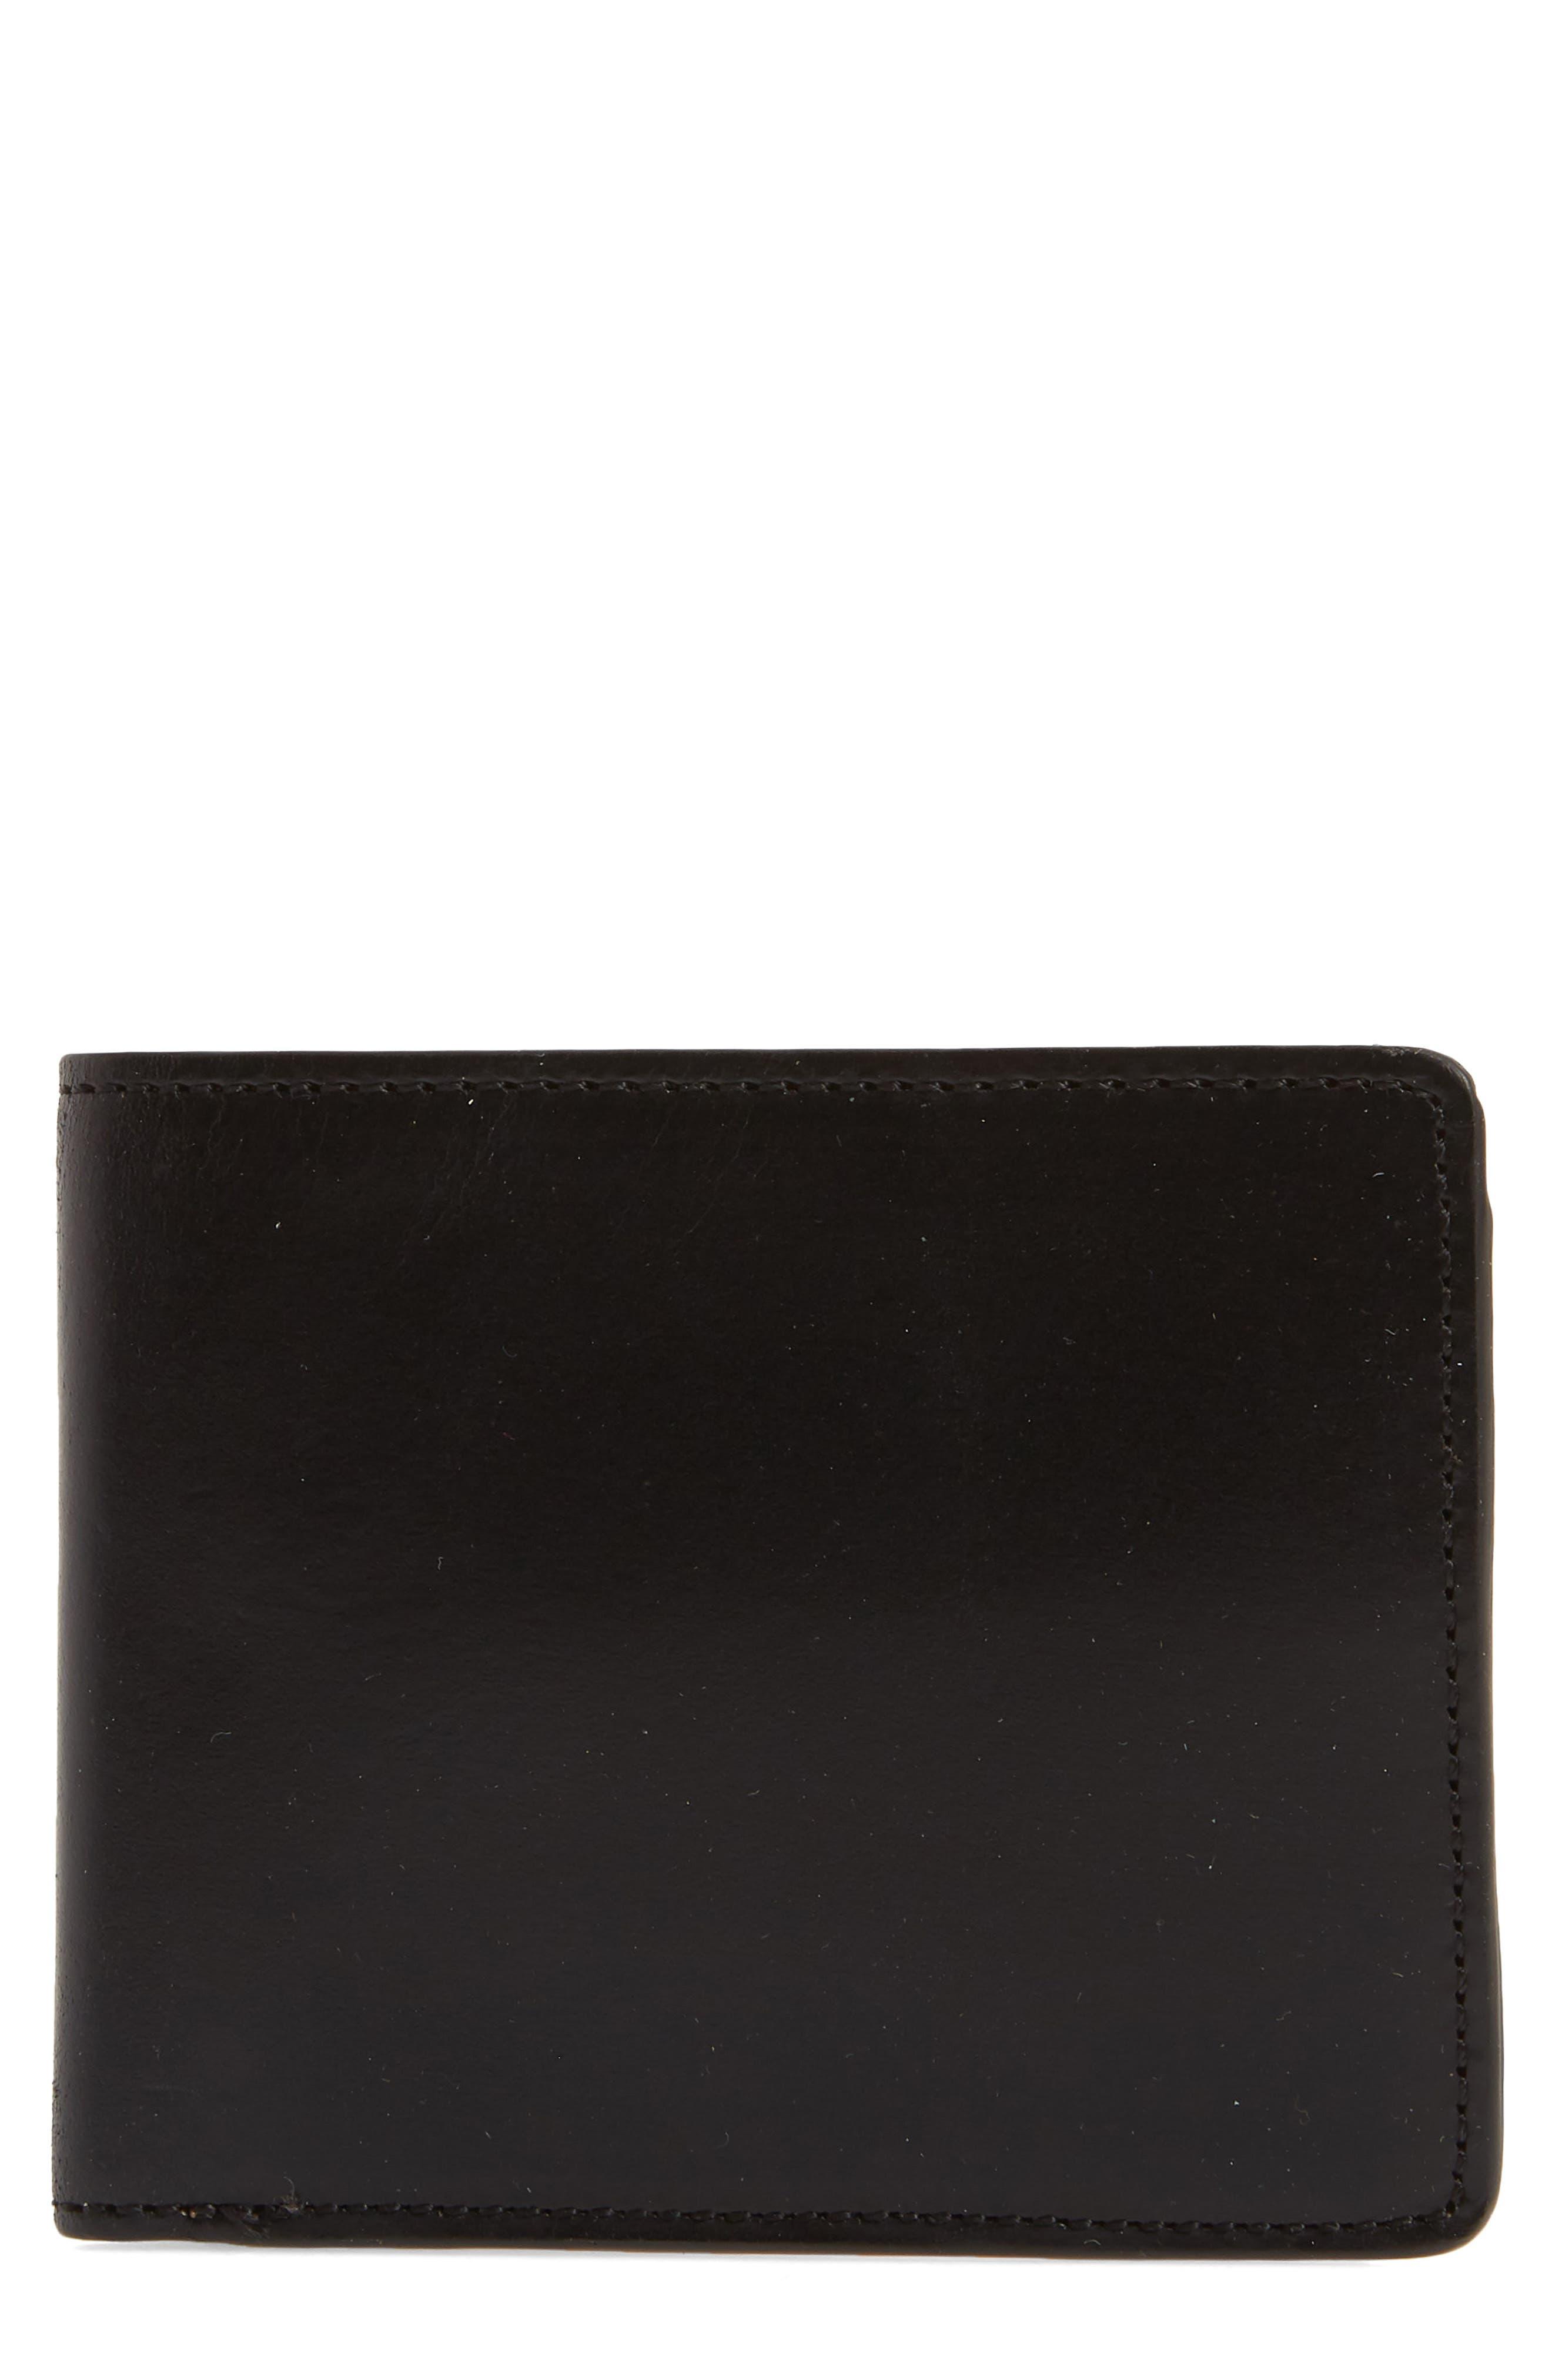 Darien Leather Wallet,                             Main thumbnail 1, color,                             001